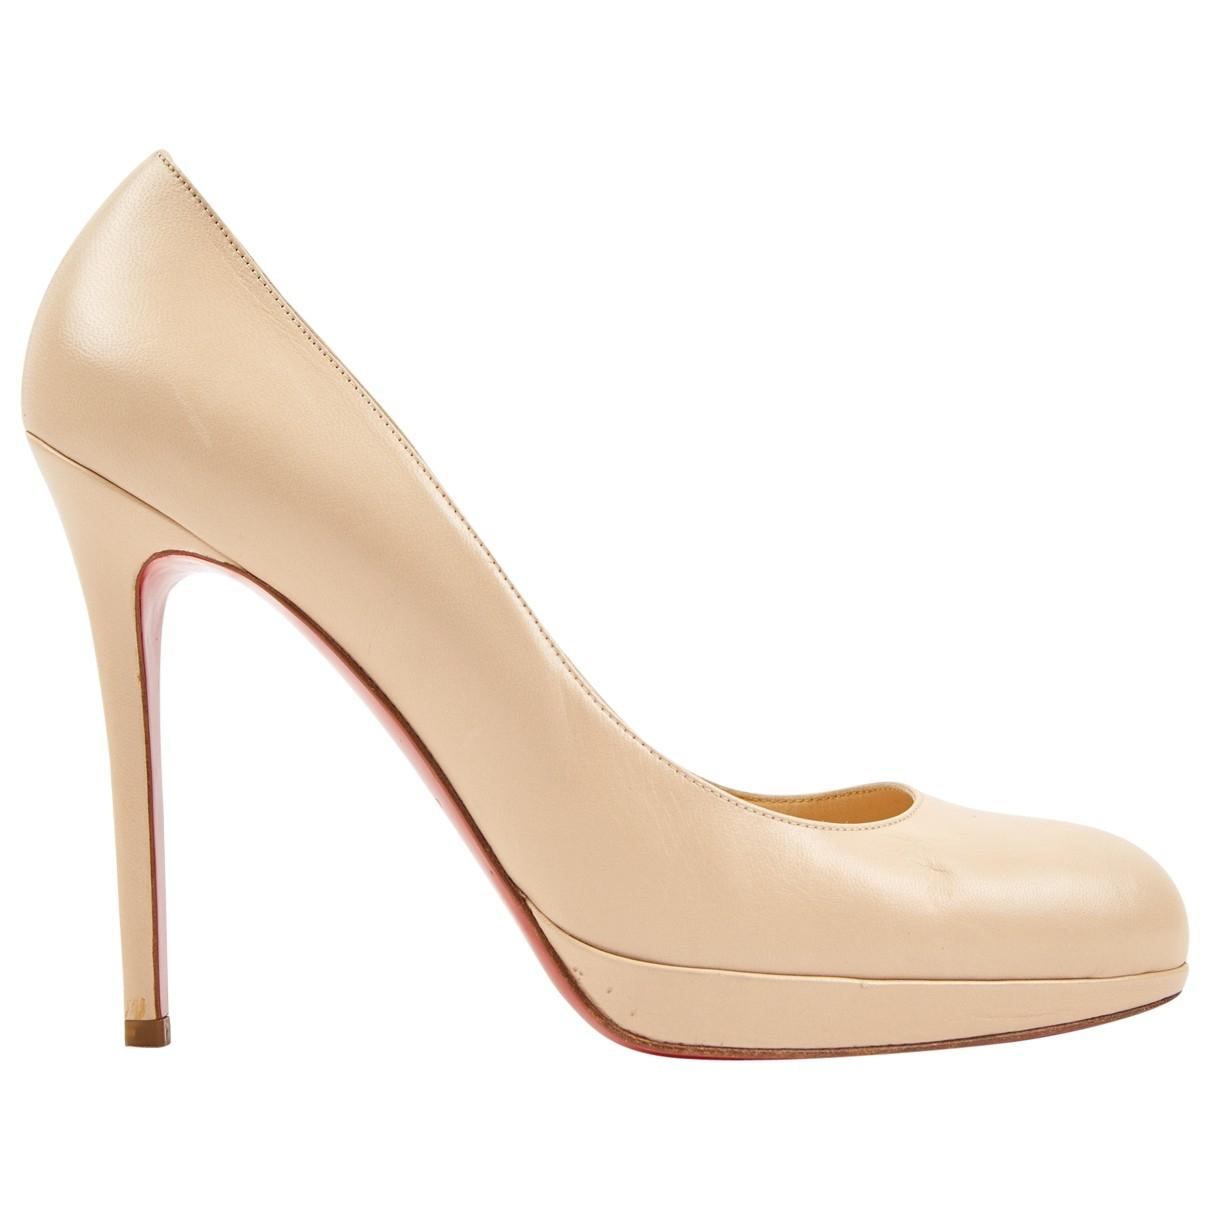 Christian Louboutin Simple pump Beige Leather Heels for Women 40.5 EU